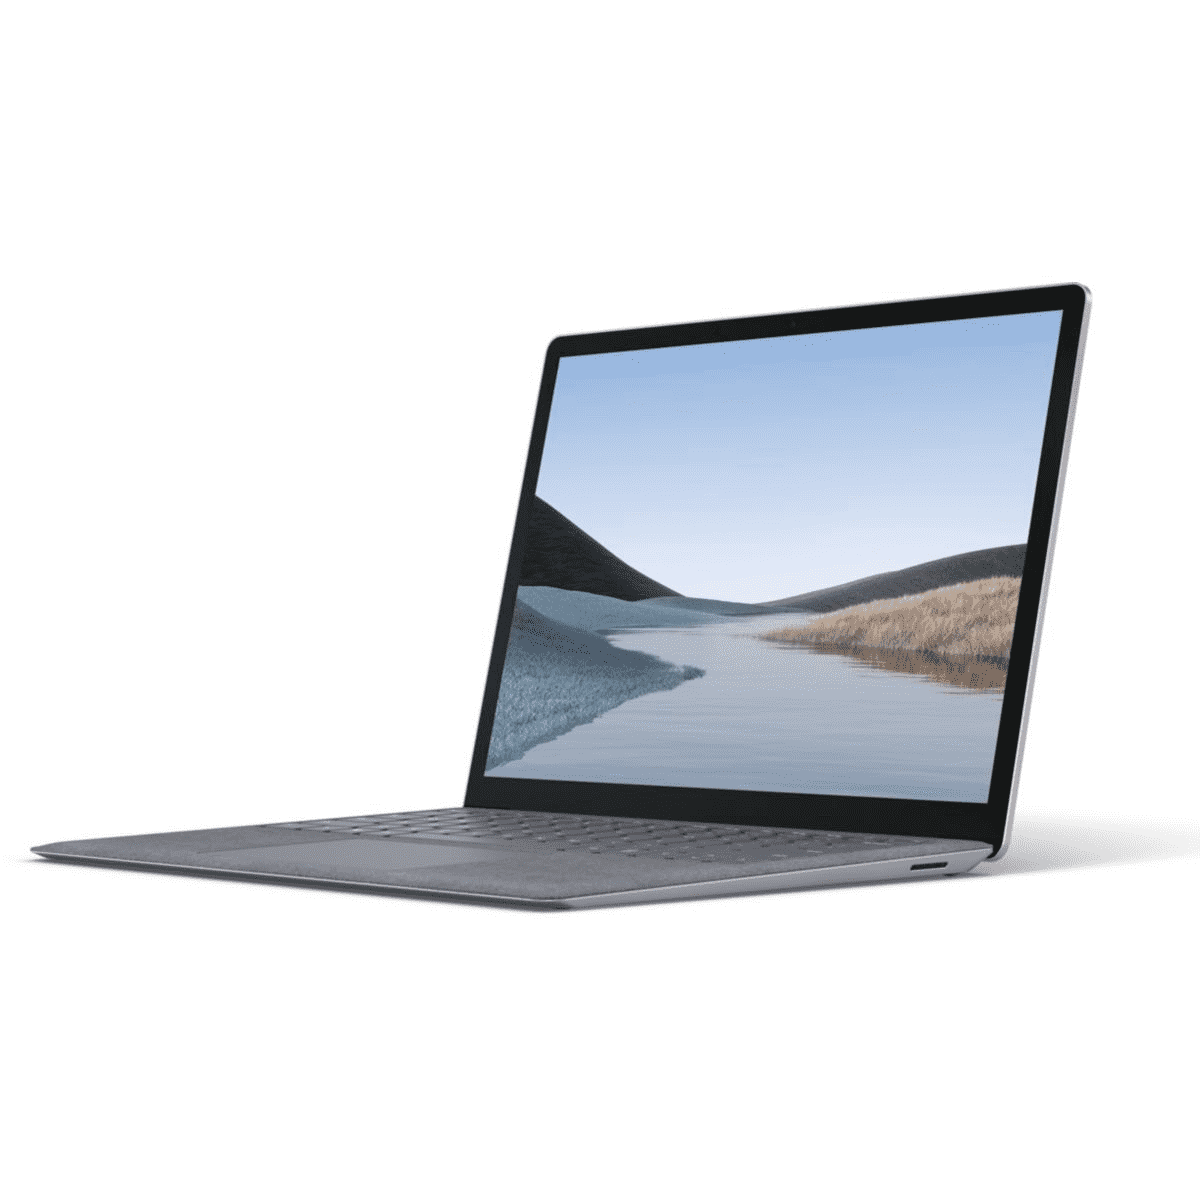 Microsoft_Surface_Laptop_3_Adeo_informatique_Perpignan